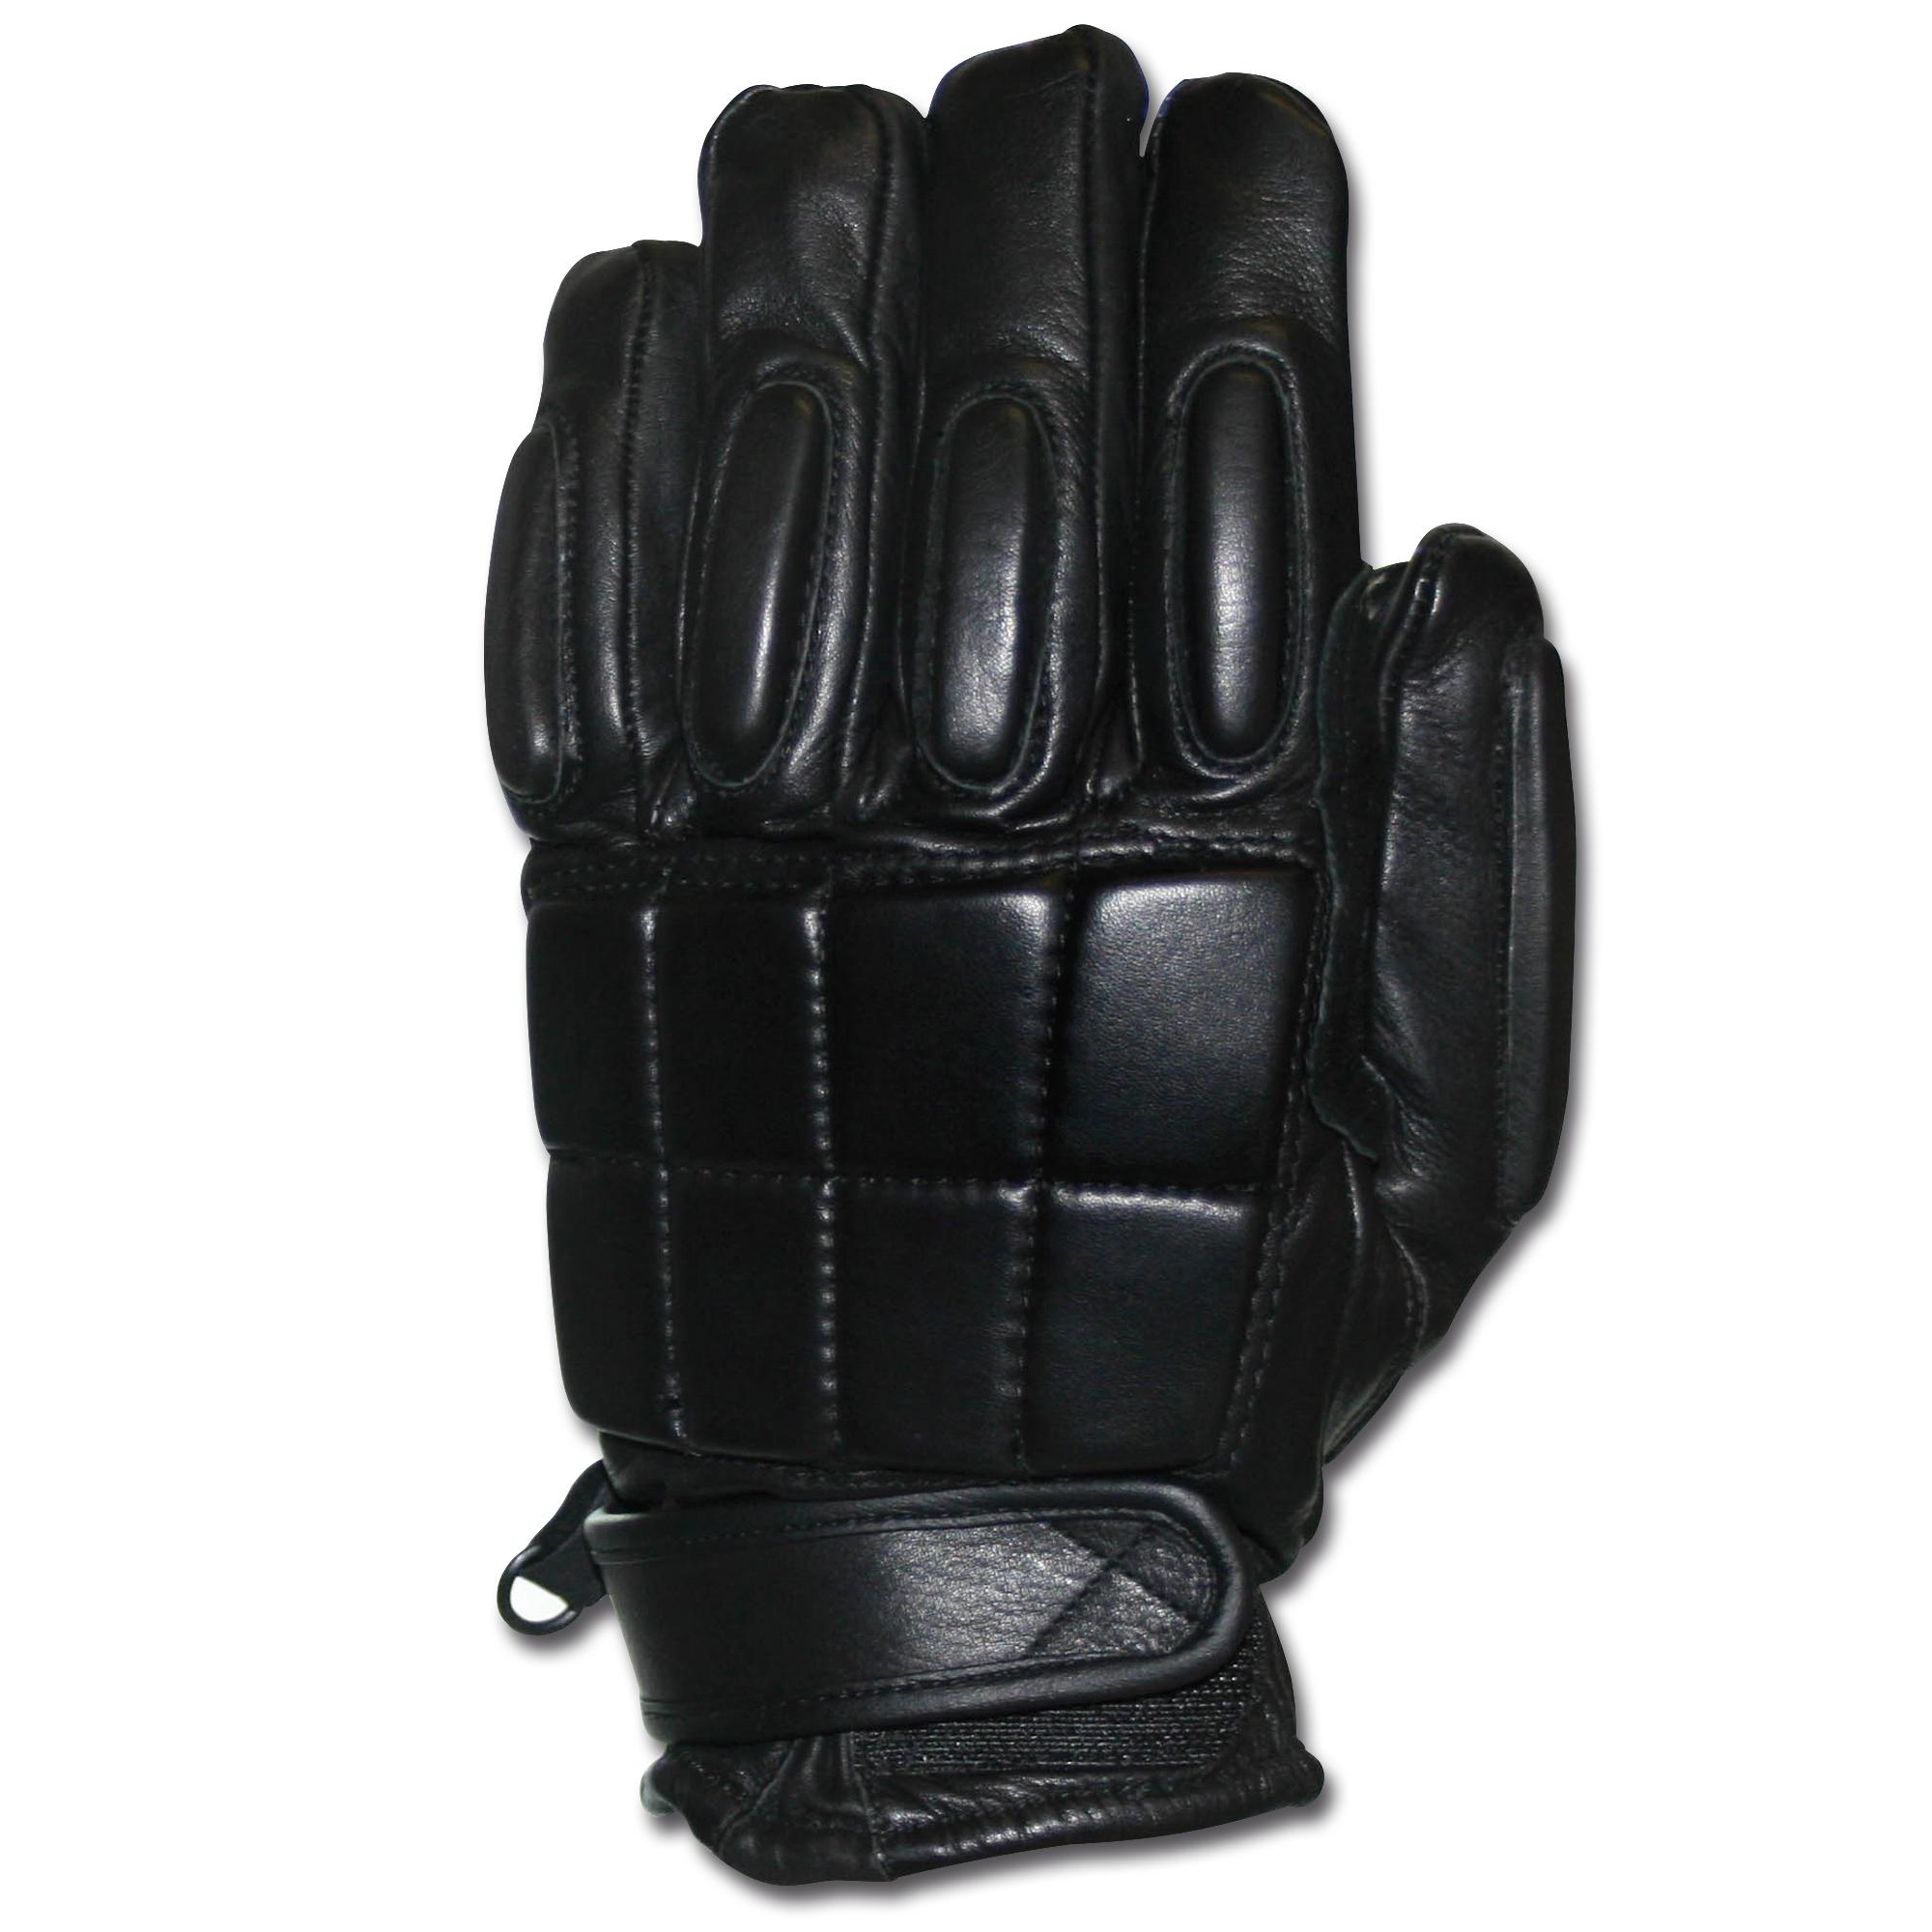 Handschuhe SEK Spectra